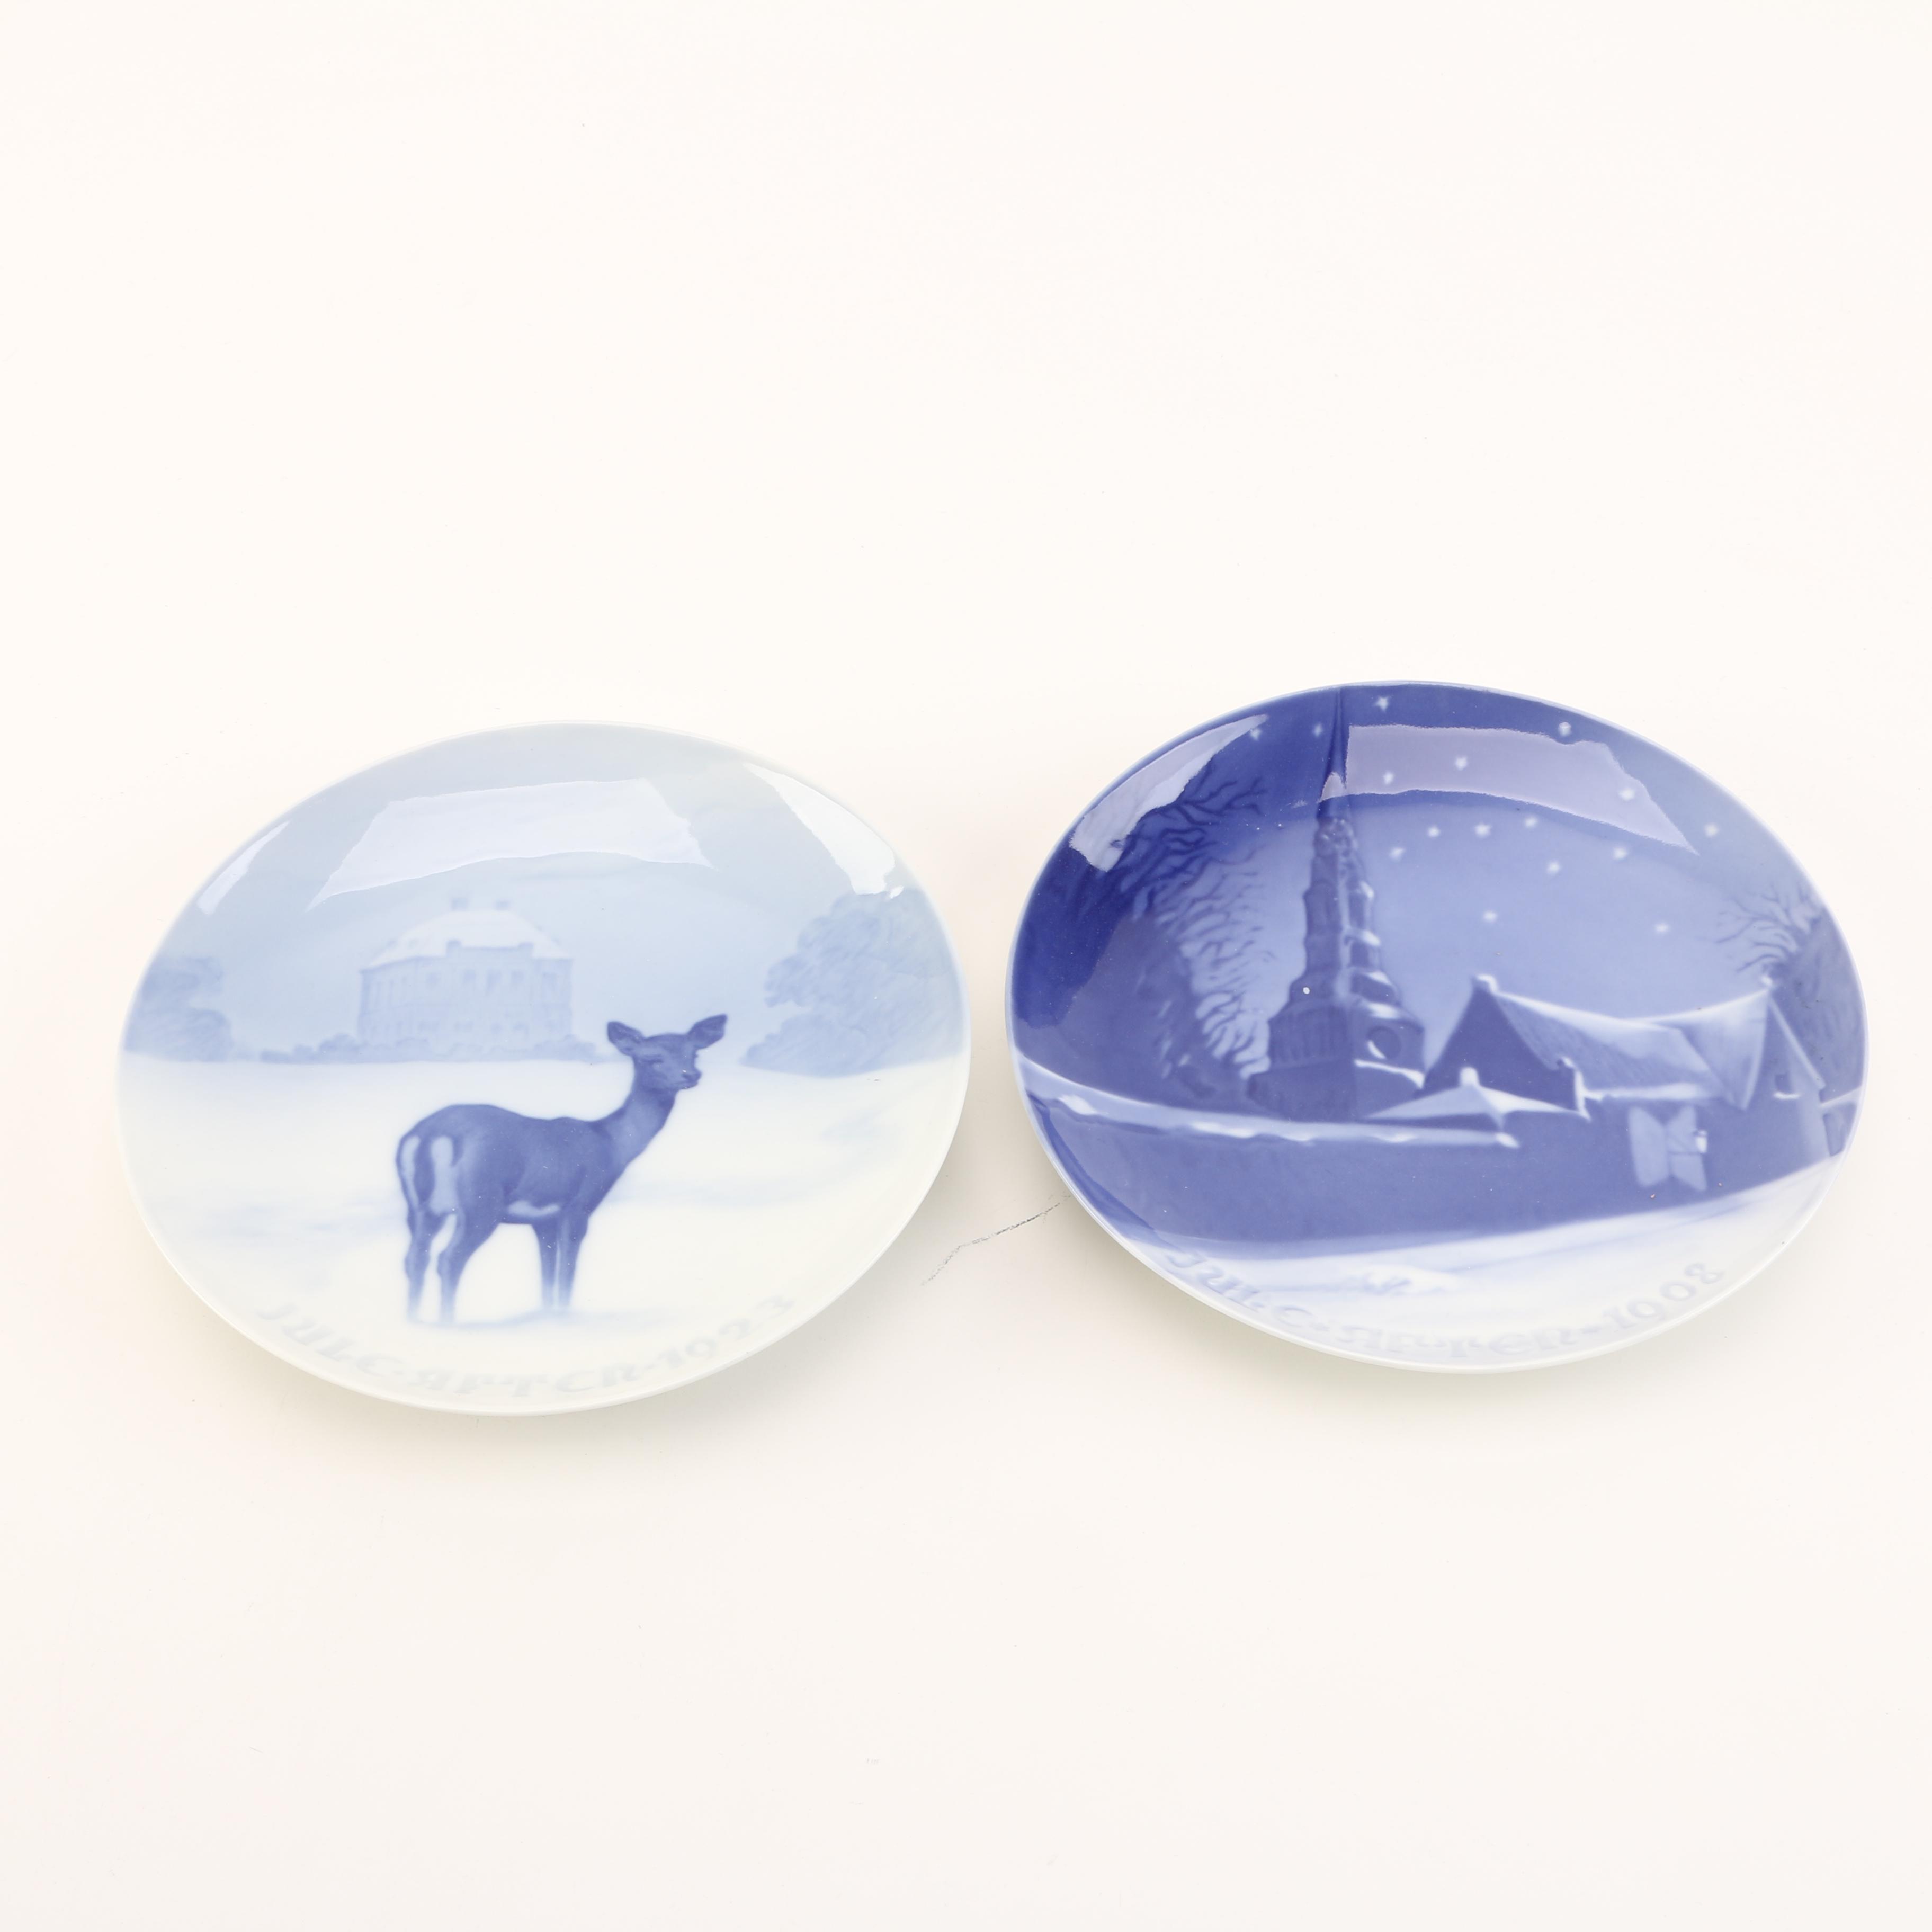 Bing & Grøndahl Porcelain Collector's Plates